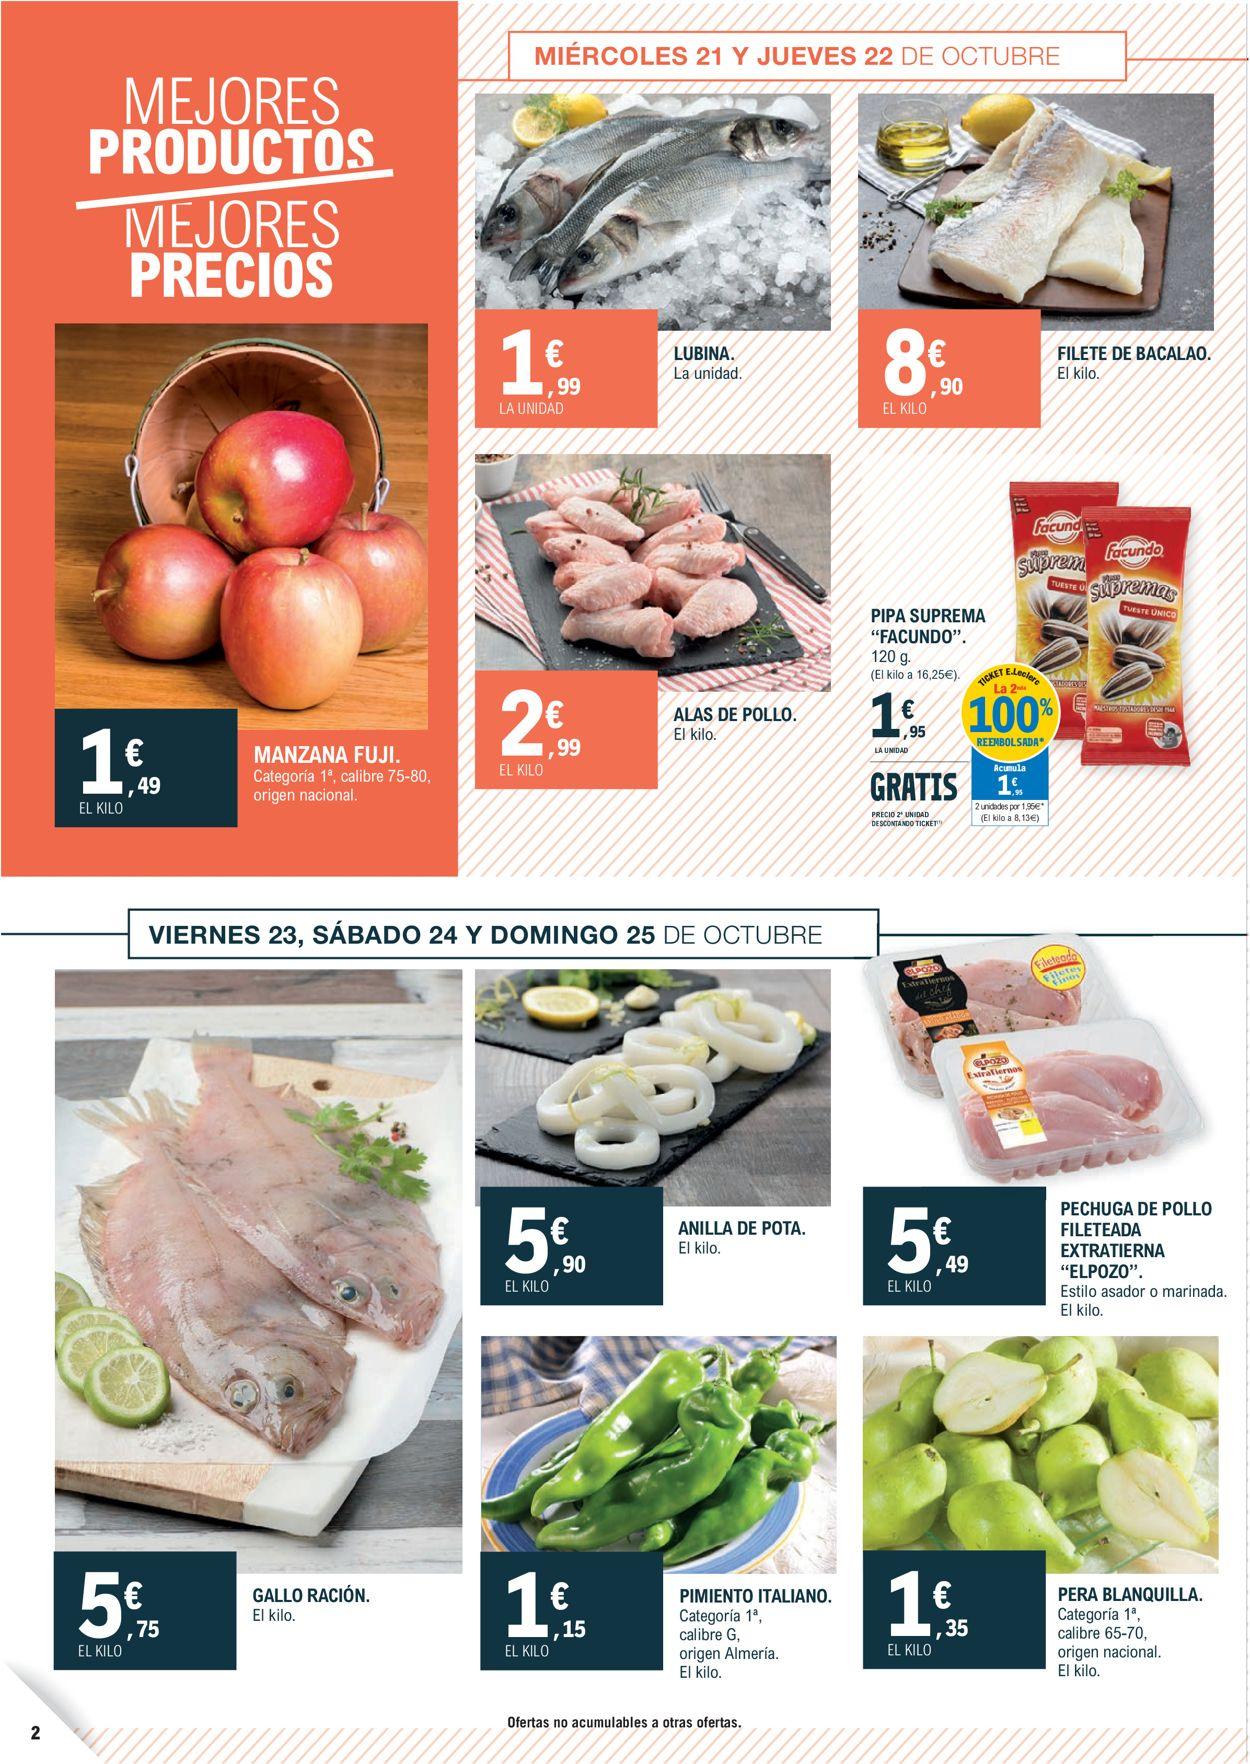 E.leclerc Folleto - 21.10-01.11.2020 (Página 2)